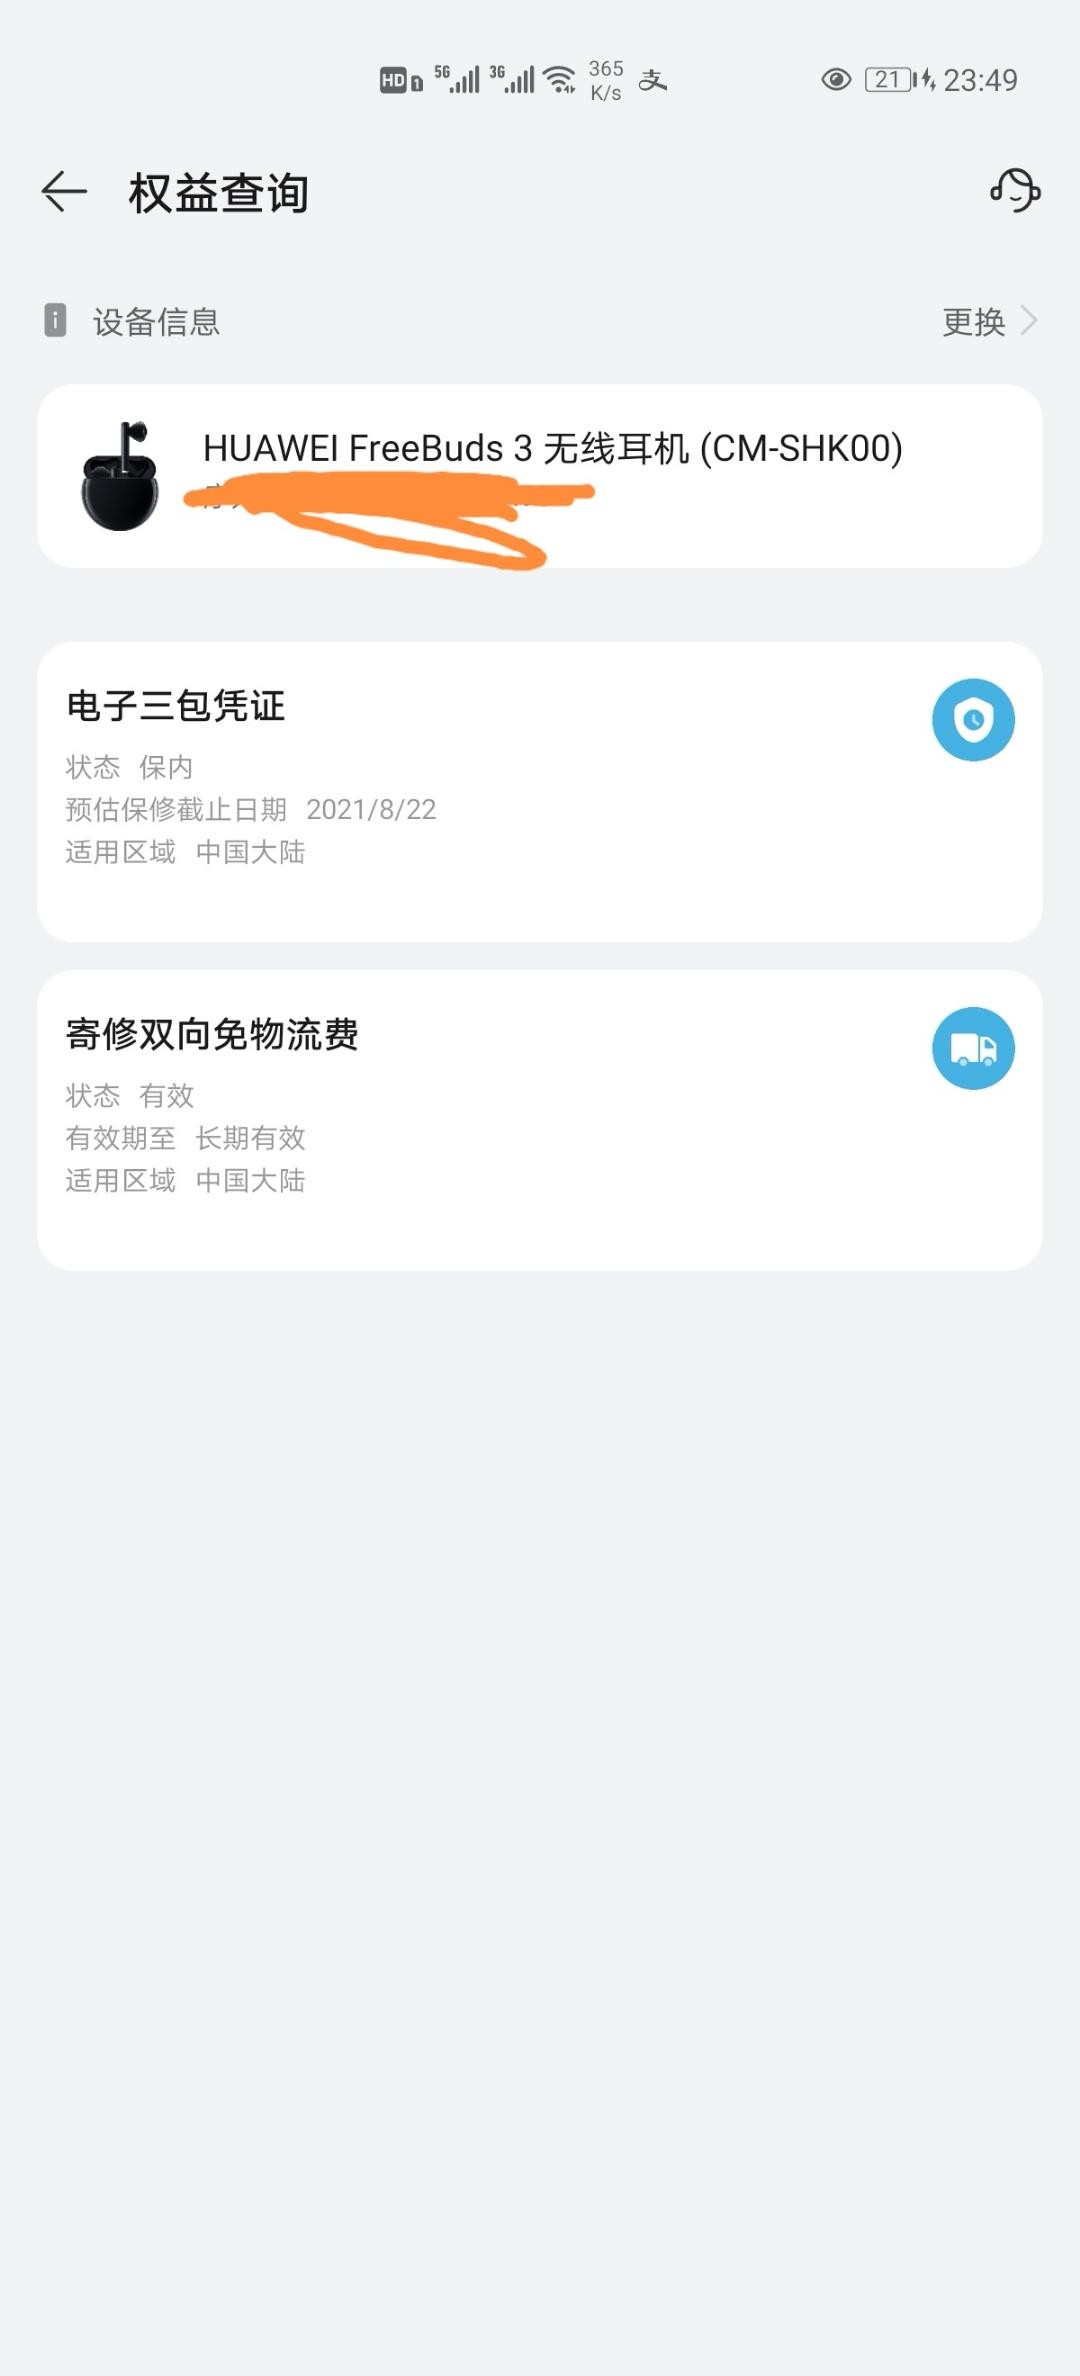 Screenshot_20210617_234911_com.huawei.phoneservice_edit_750749916922944.jpg